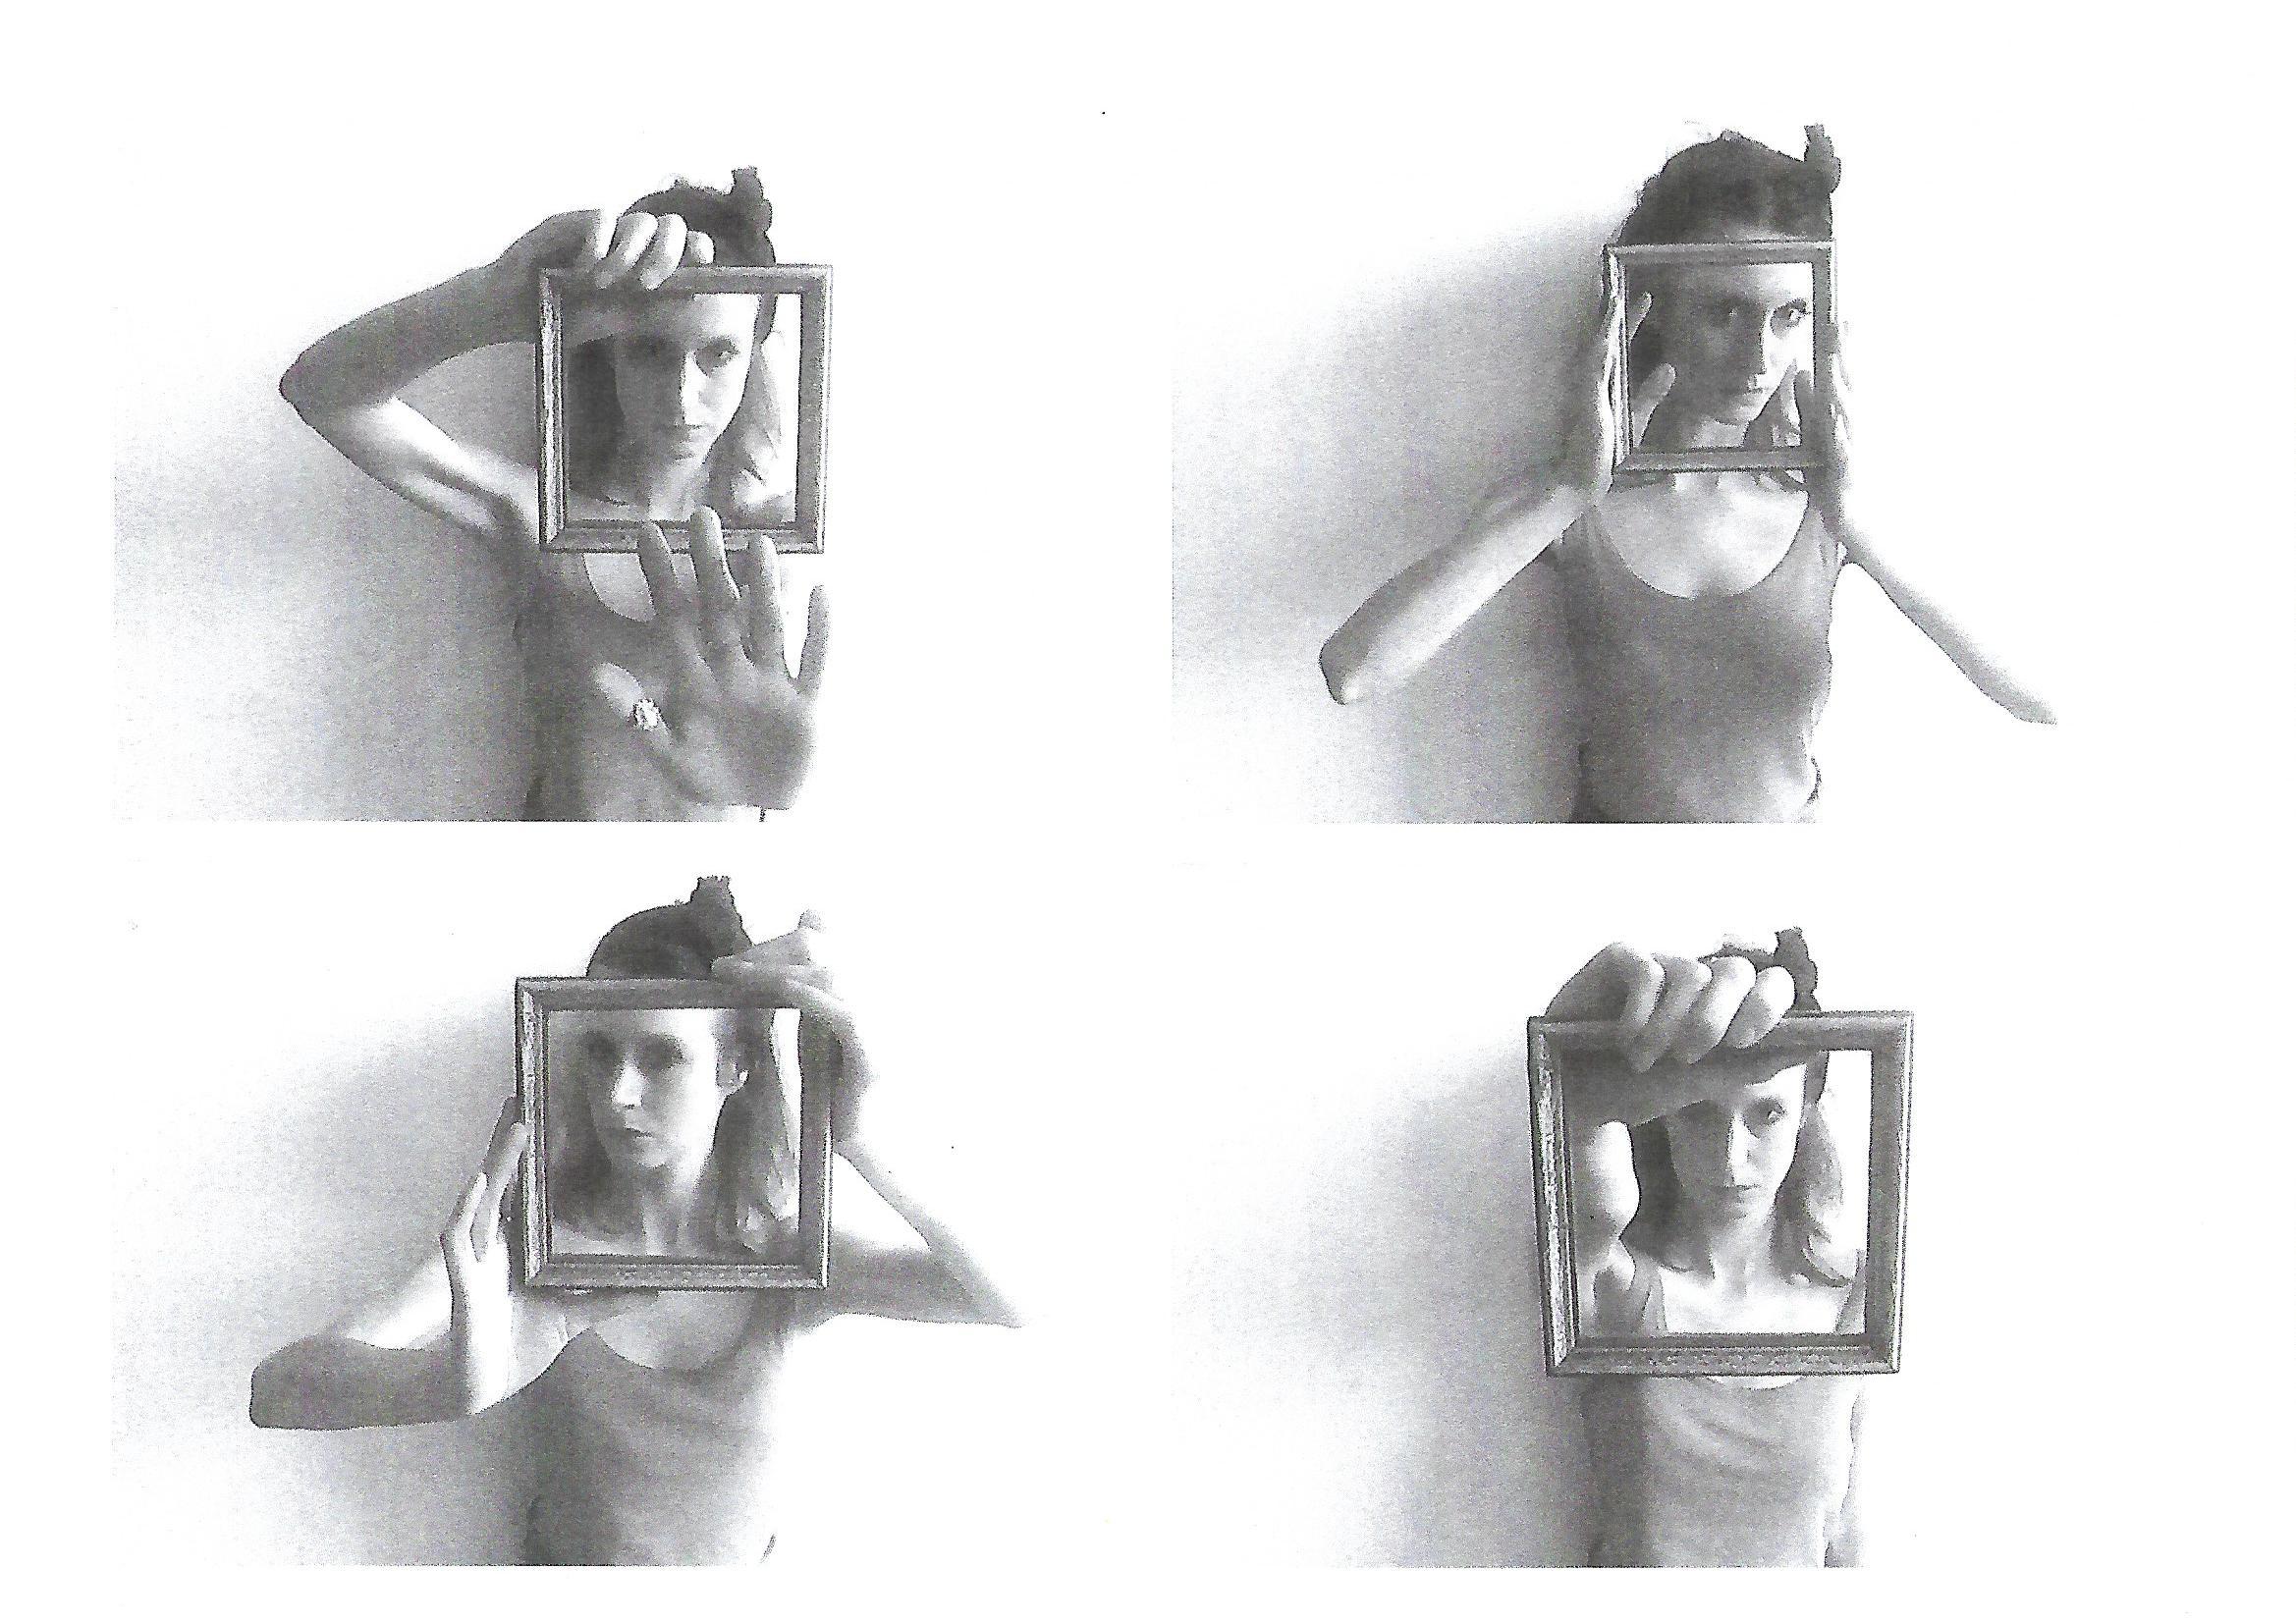 welt-sewn webcam-myths